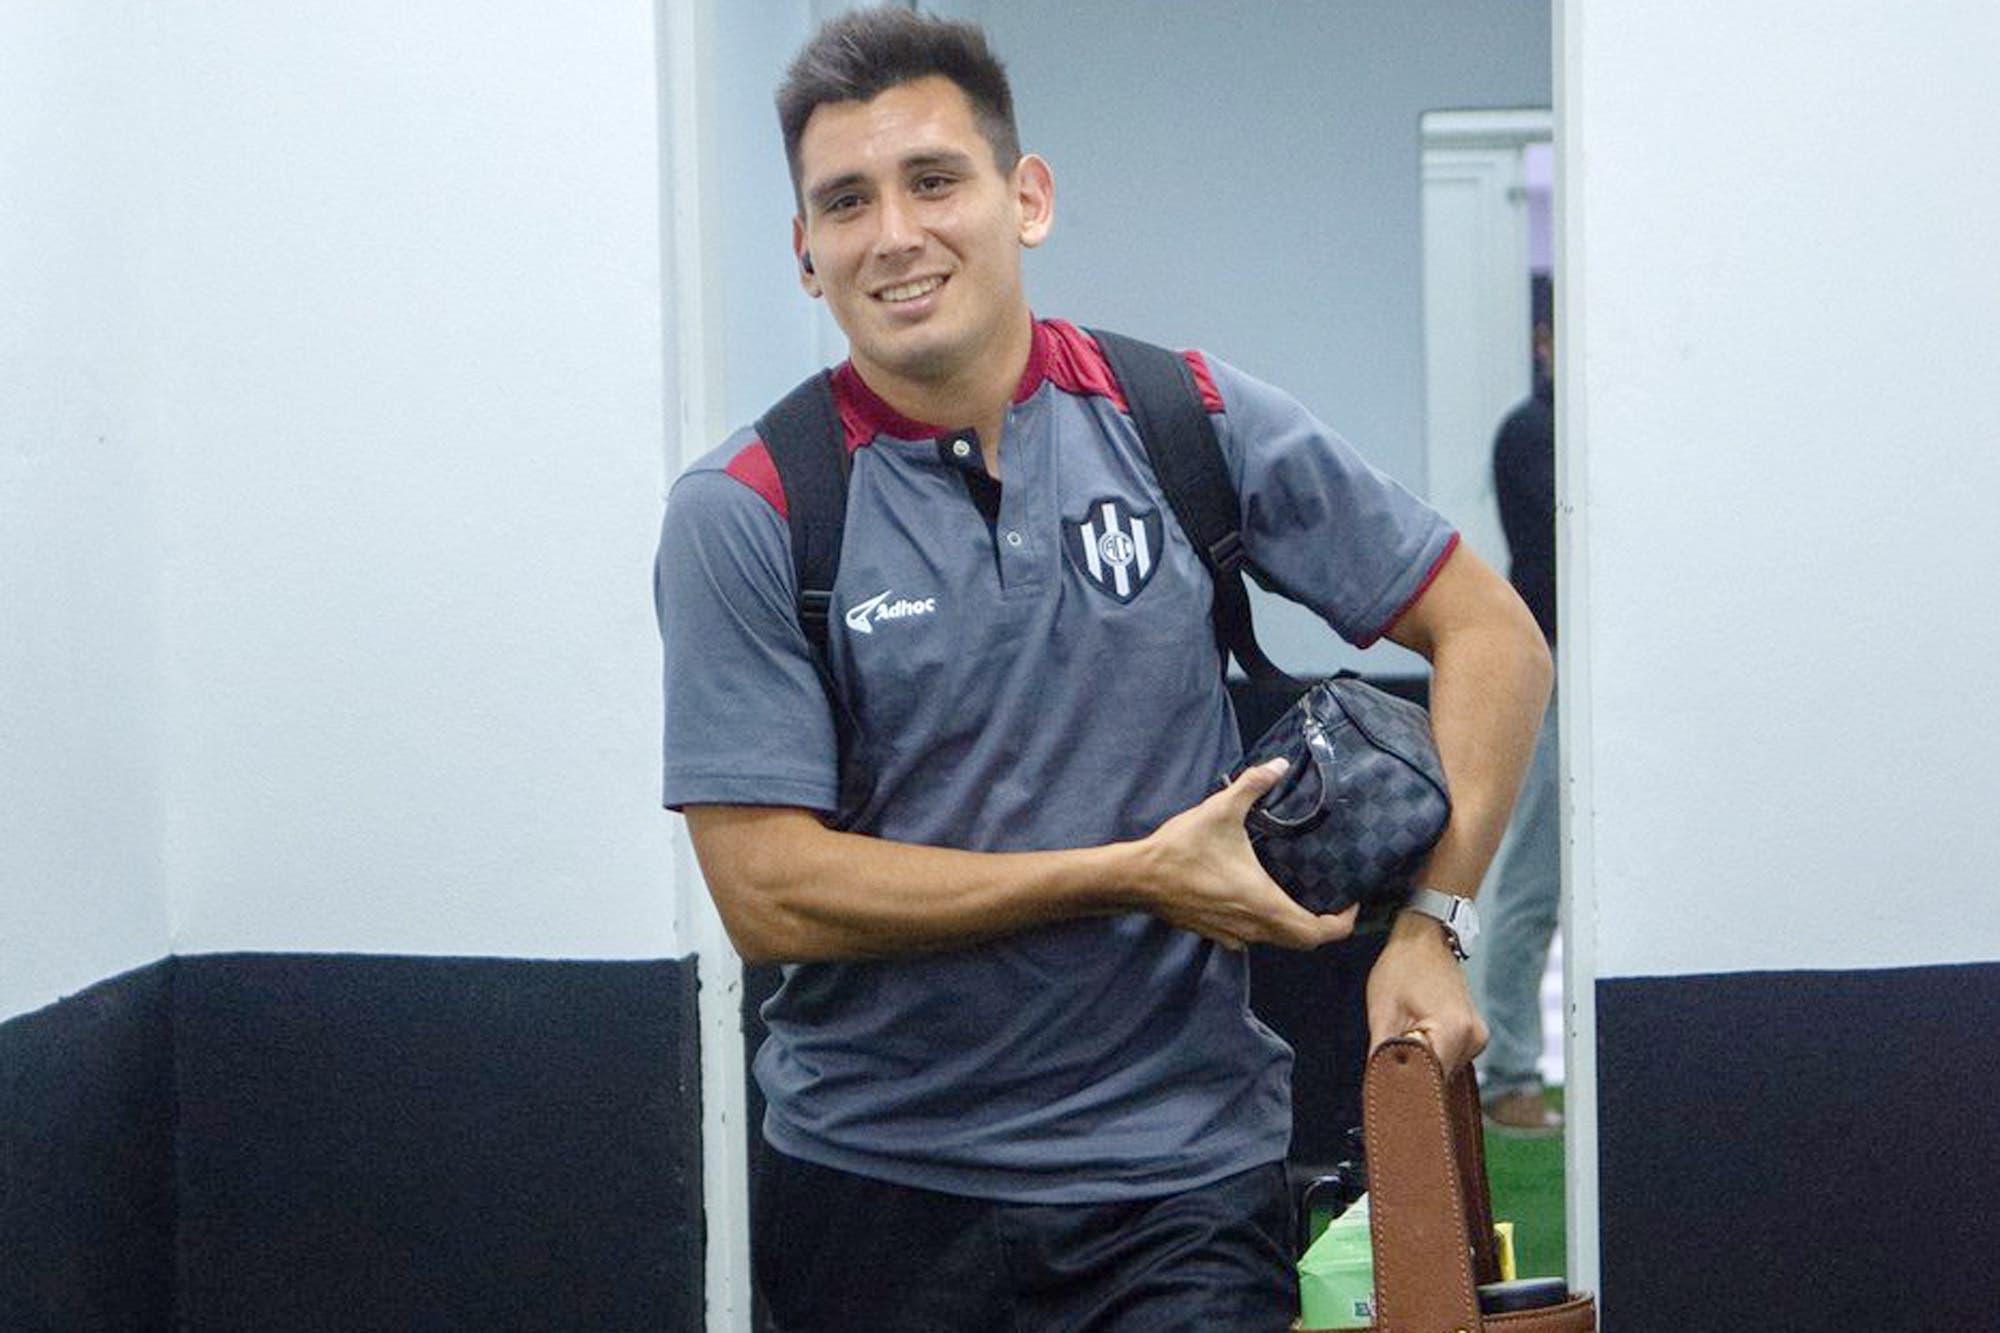 Profesor de Educación Física y capitán de Central Córdoba: Cristian Vega, el jugador que les aconseja a sus compañeros que estudien